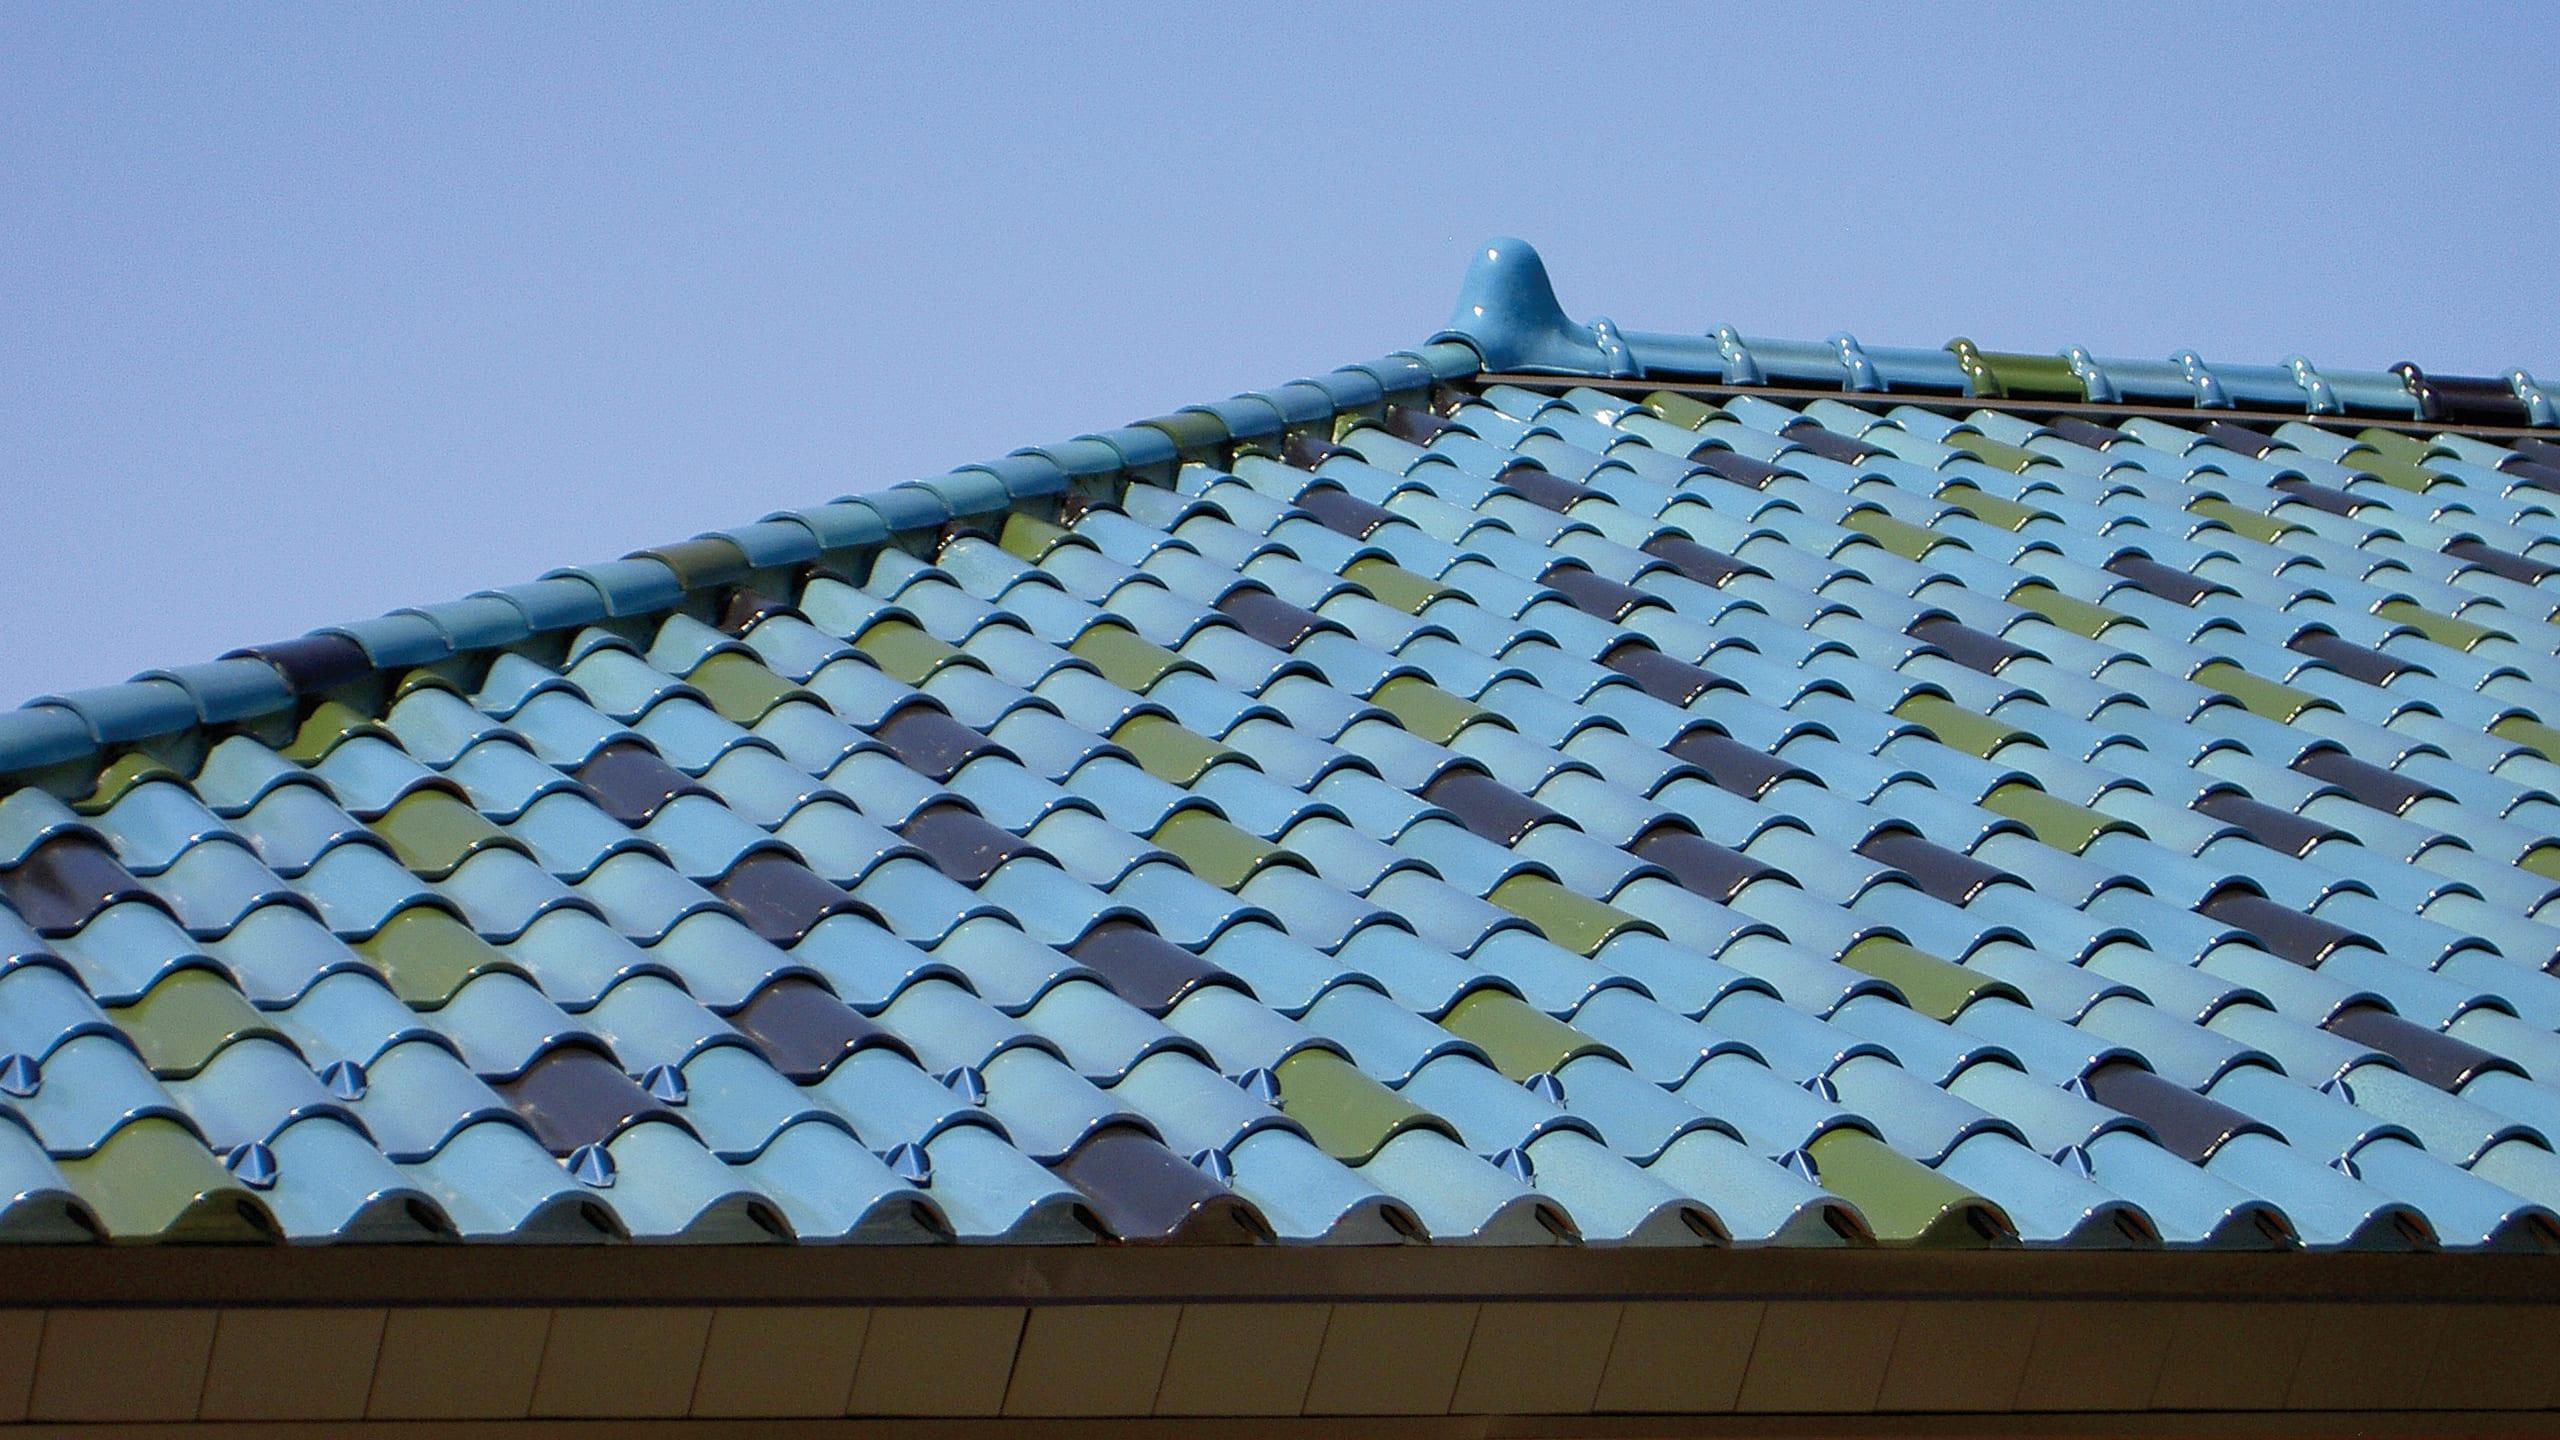 Salina Aquatic Center Ludowici Roof Tile